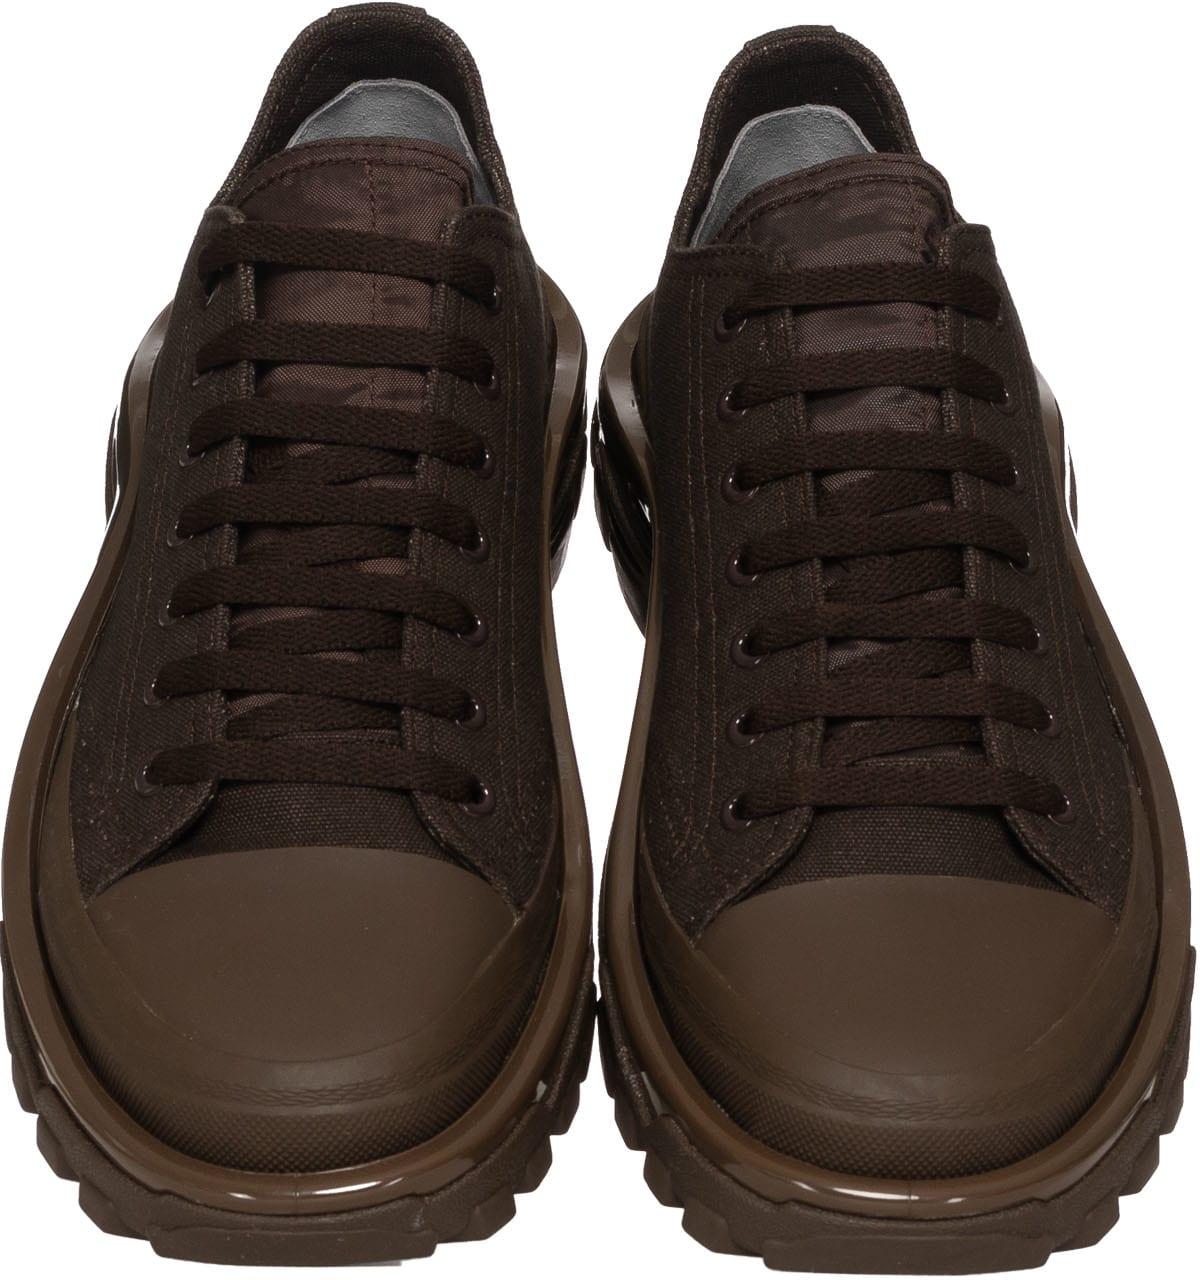 Rs Coureur Detroit Adidas Sneakers Beige K1sfpt